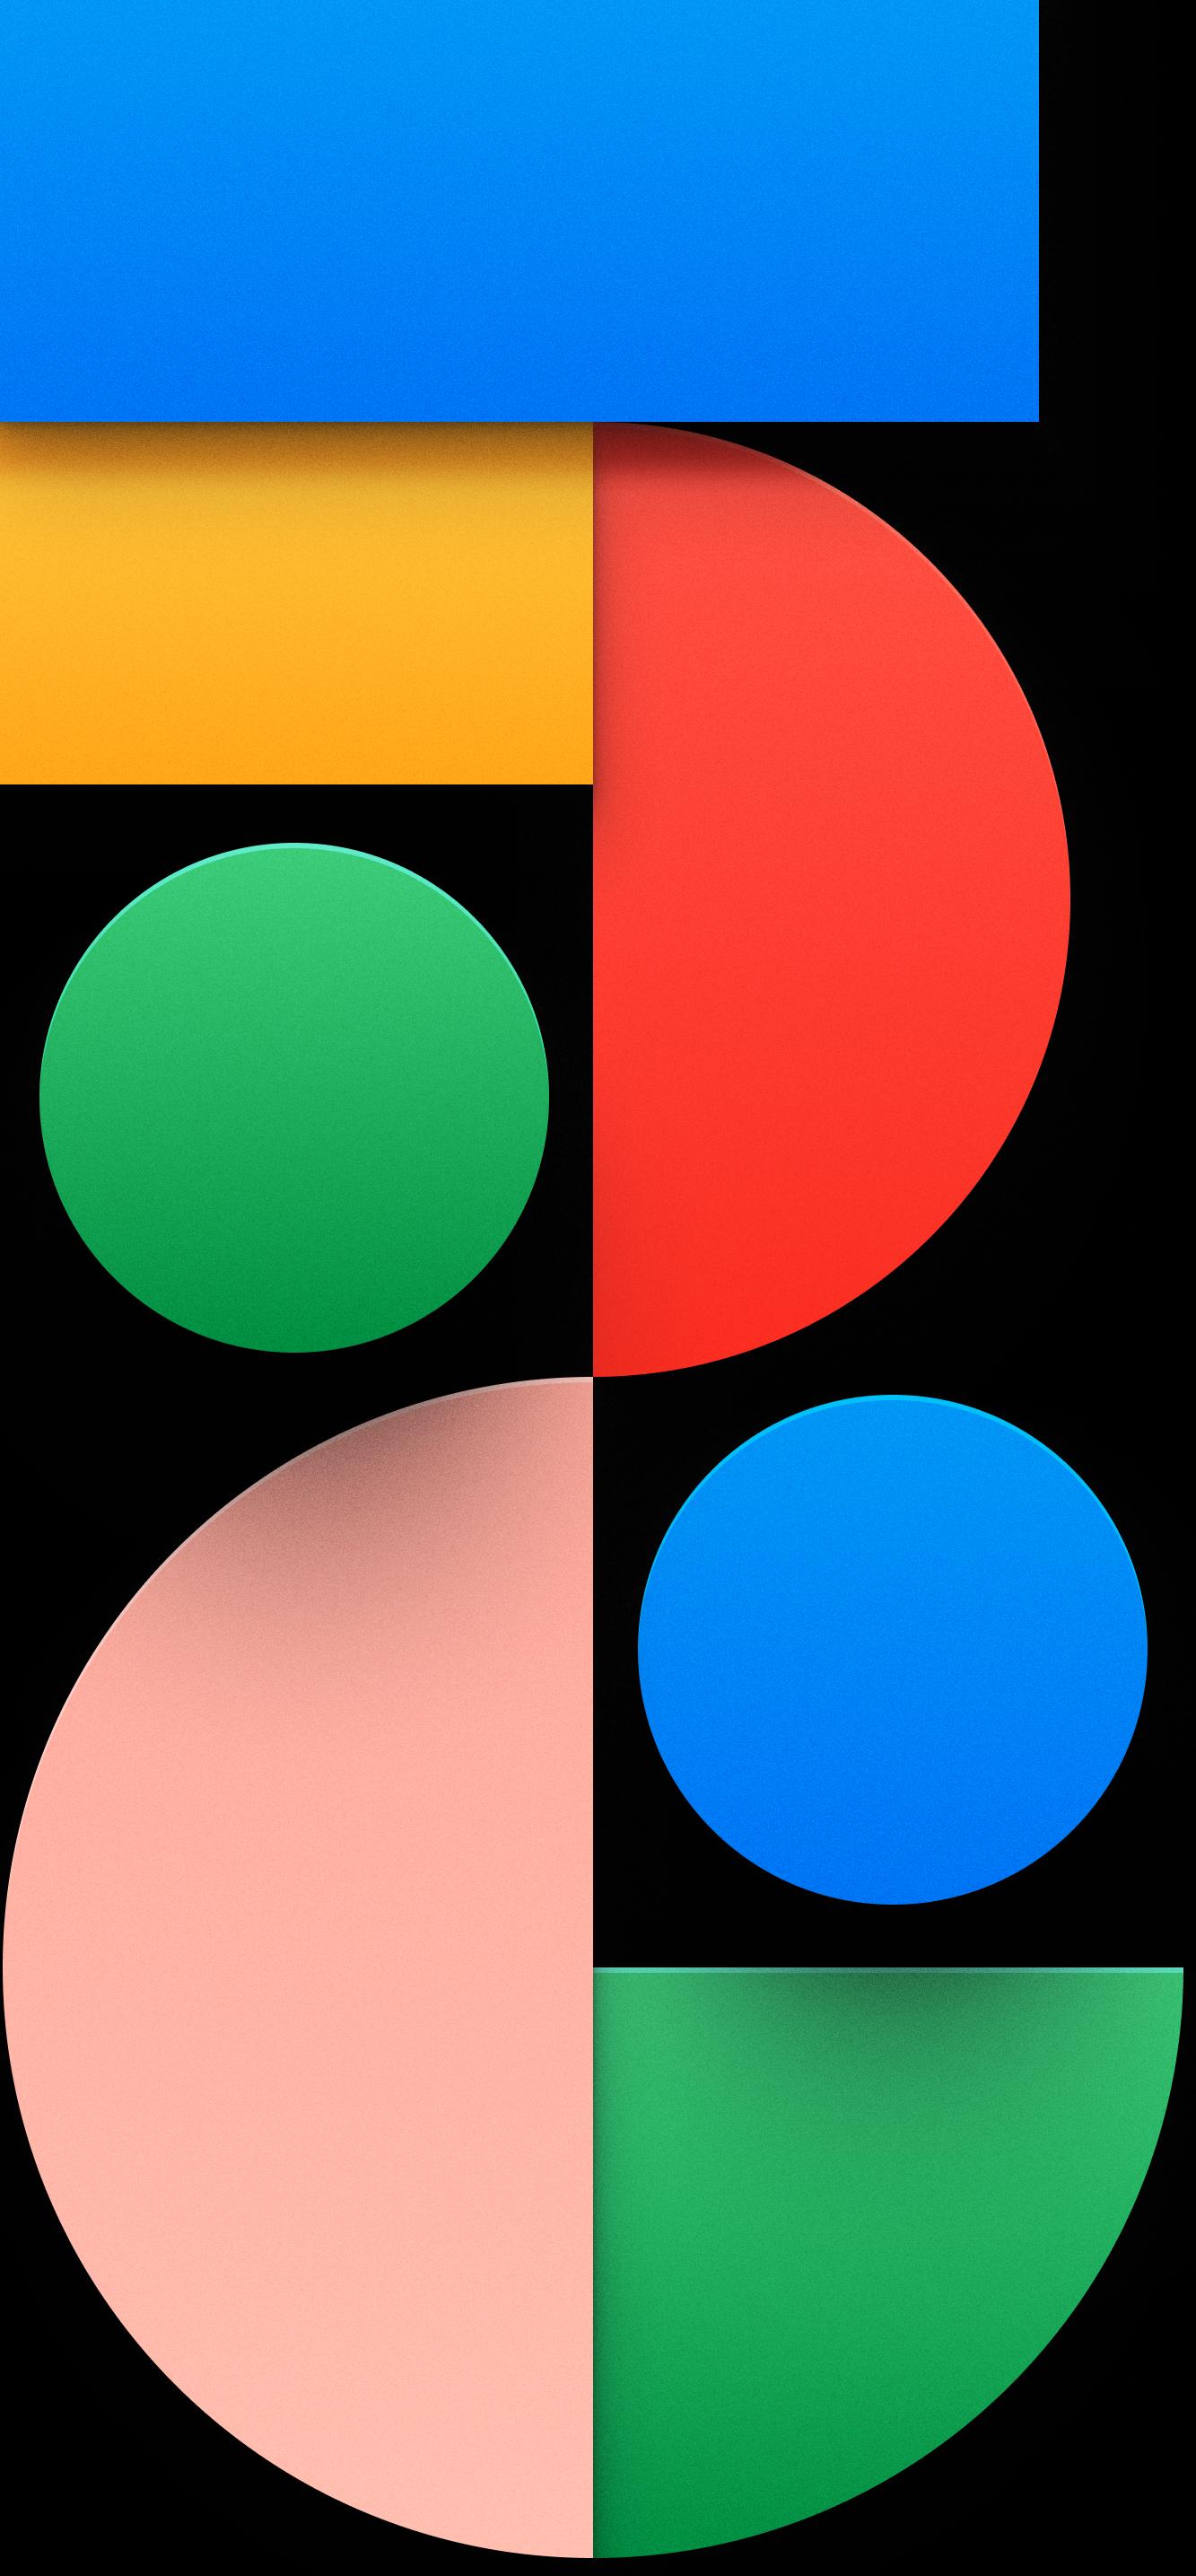 Pixel 4a 5G Wallpaper (YTECHB Exclusive)